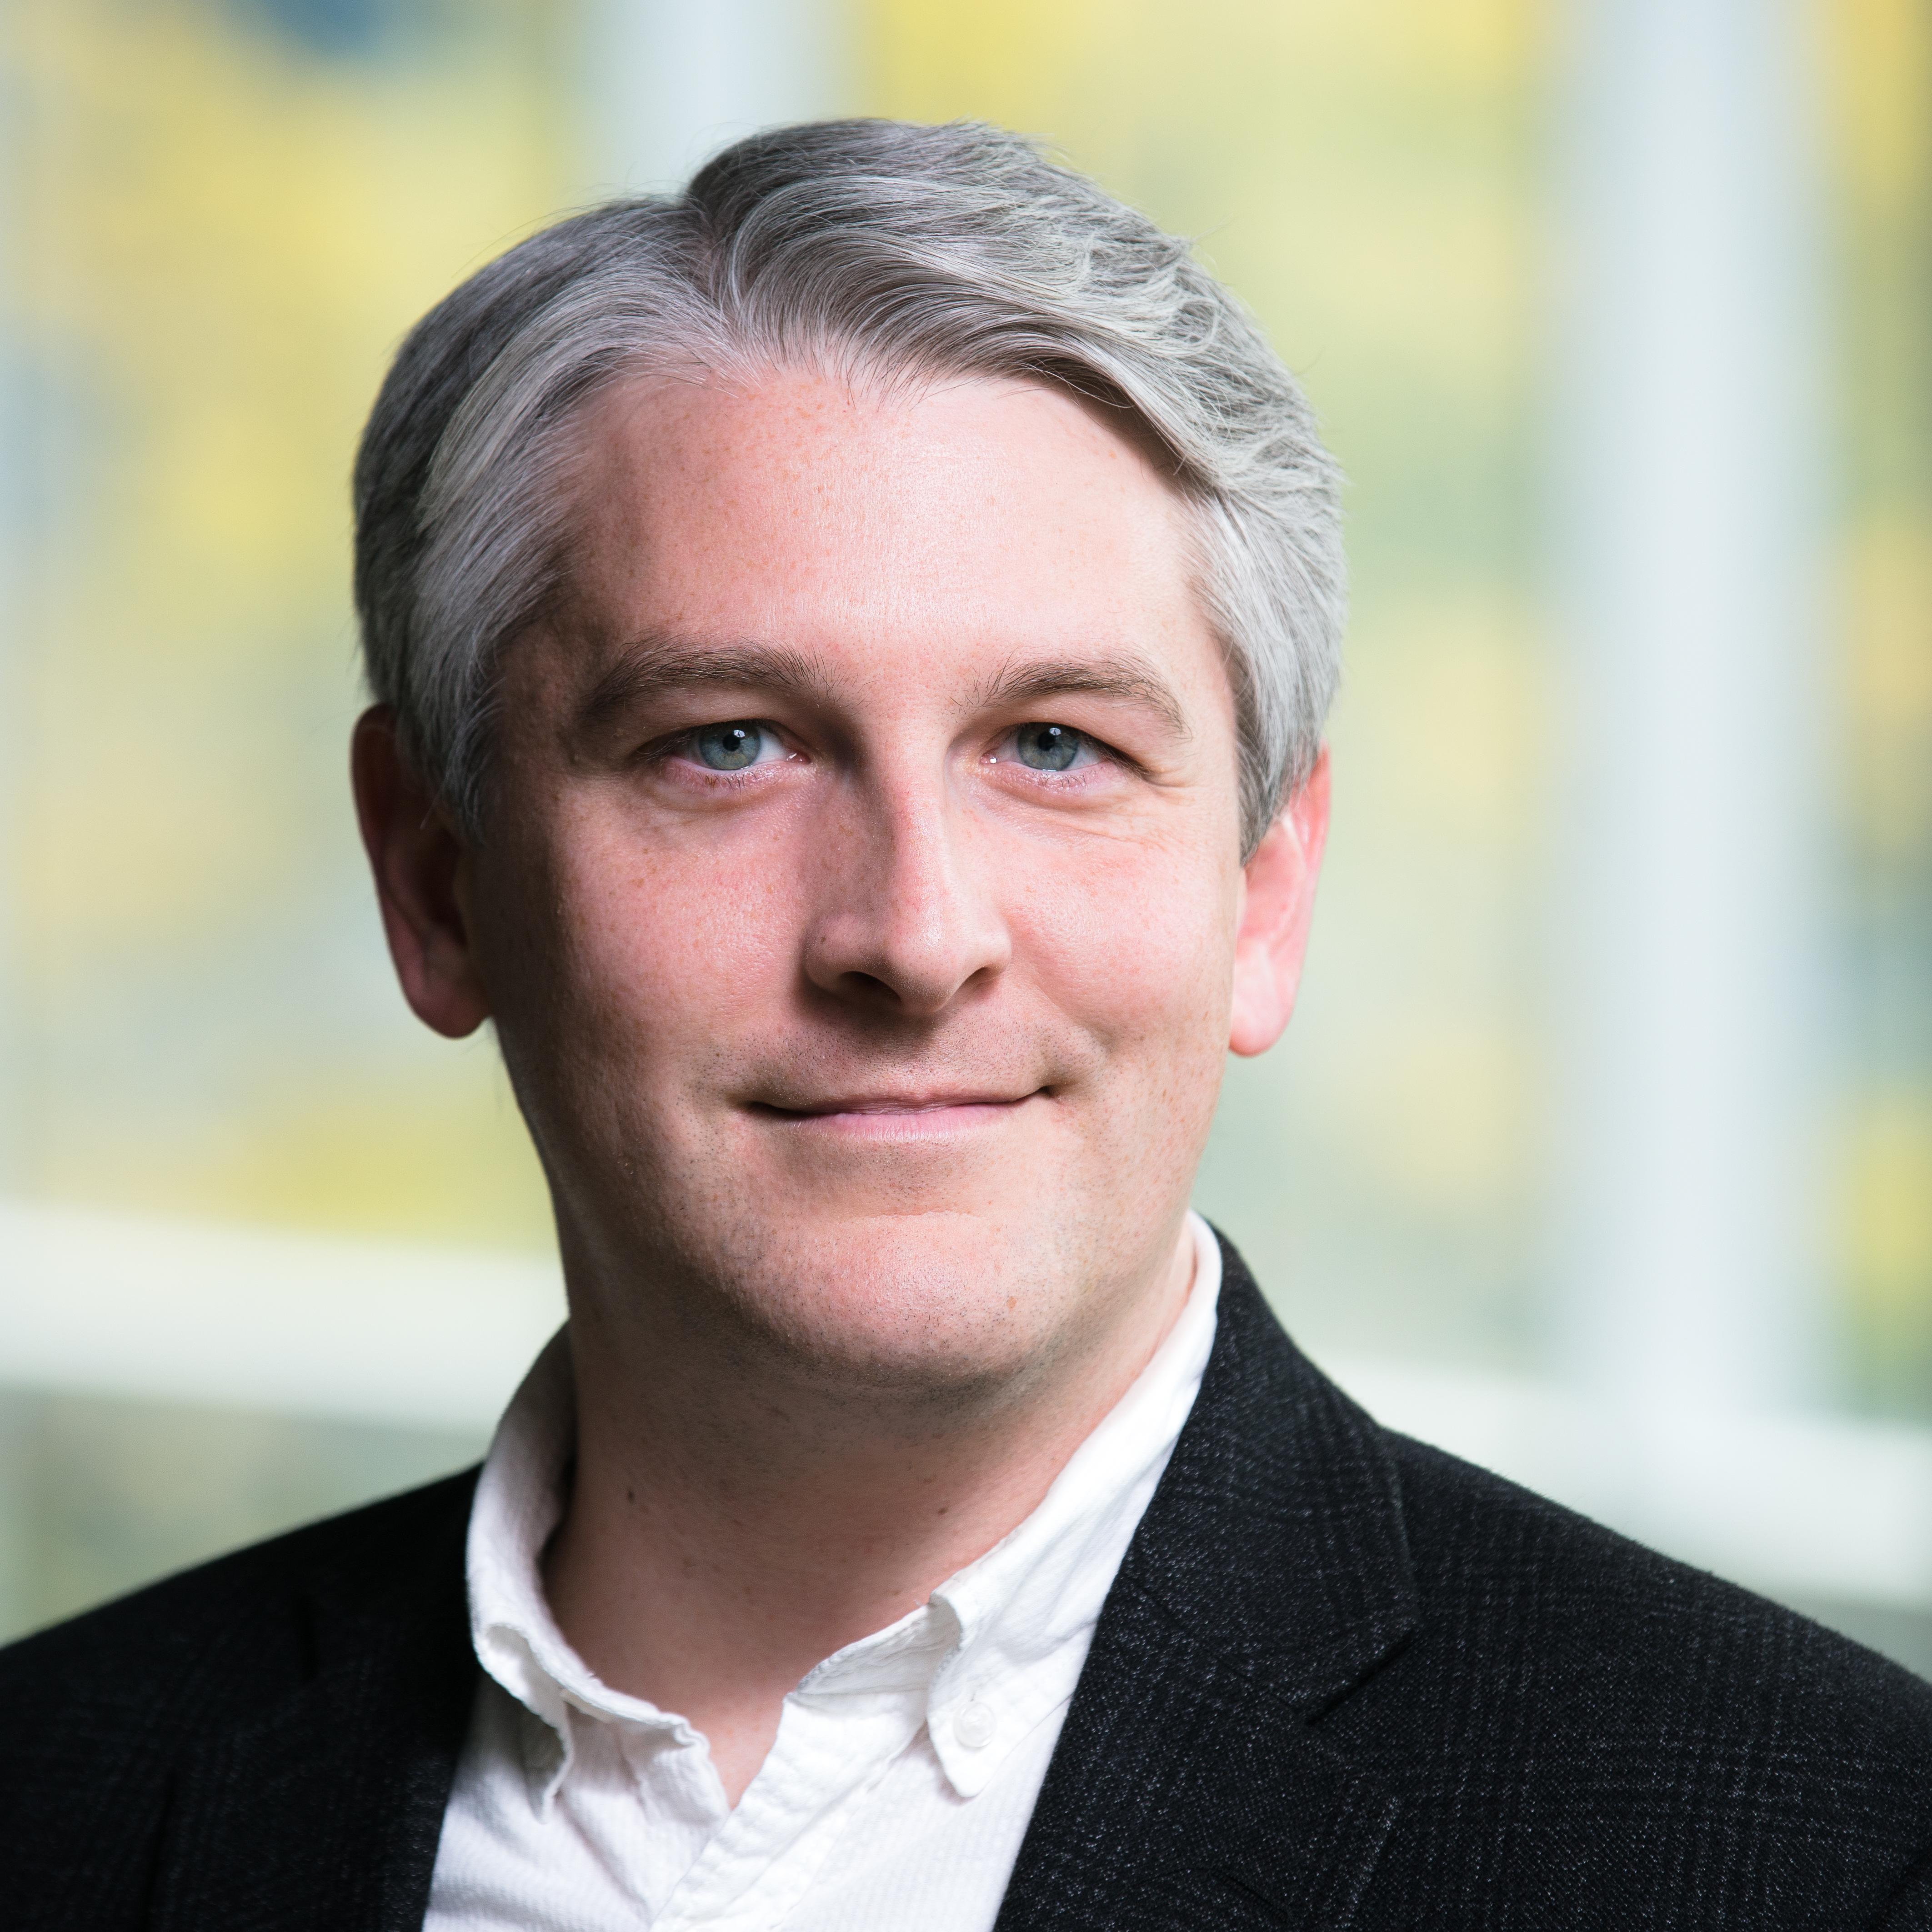 Michael McCulloch